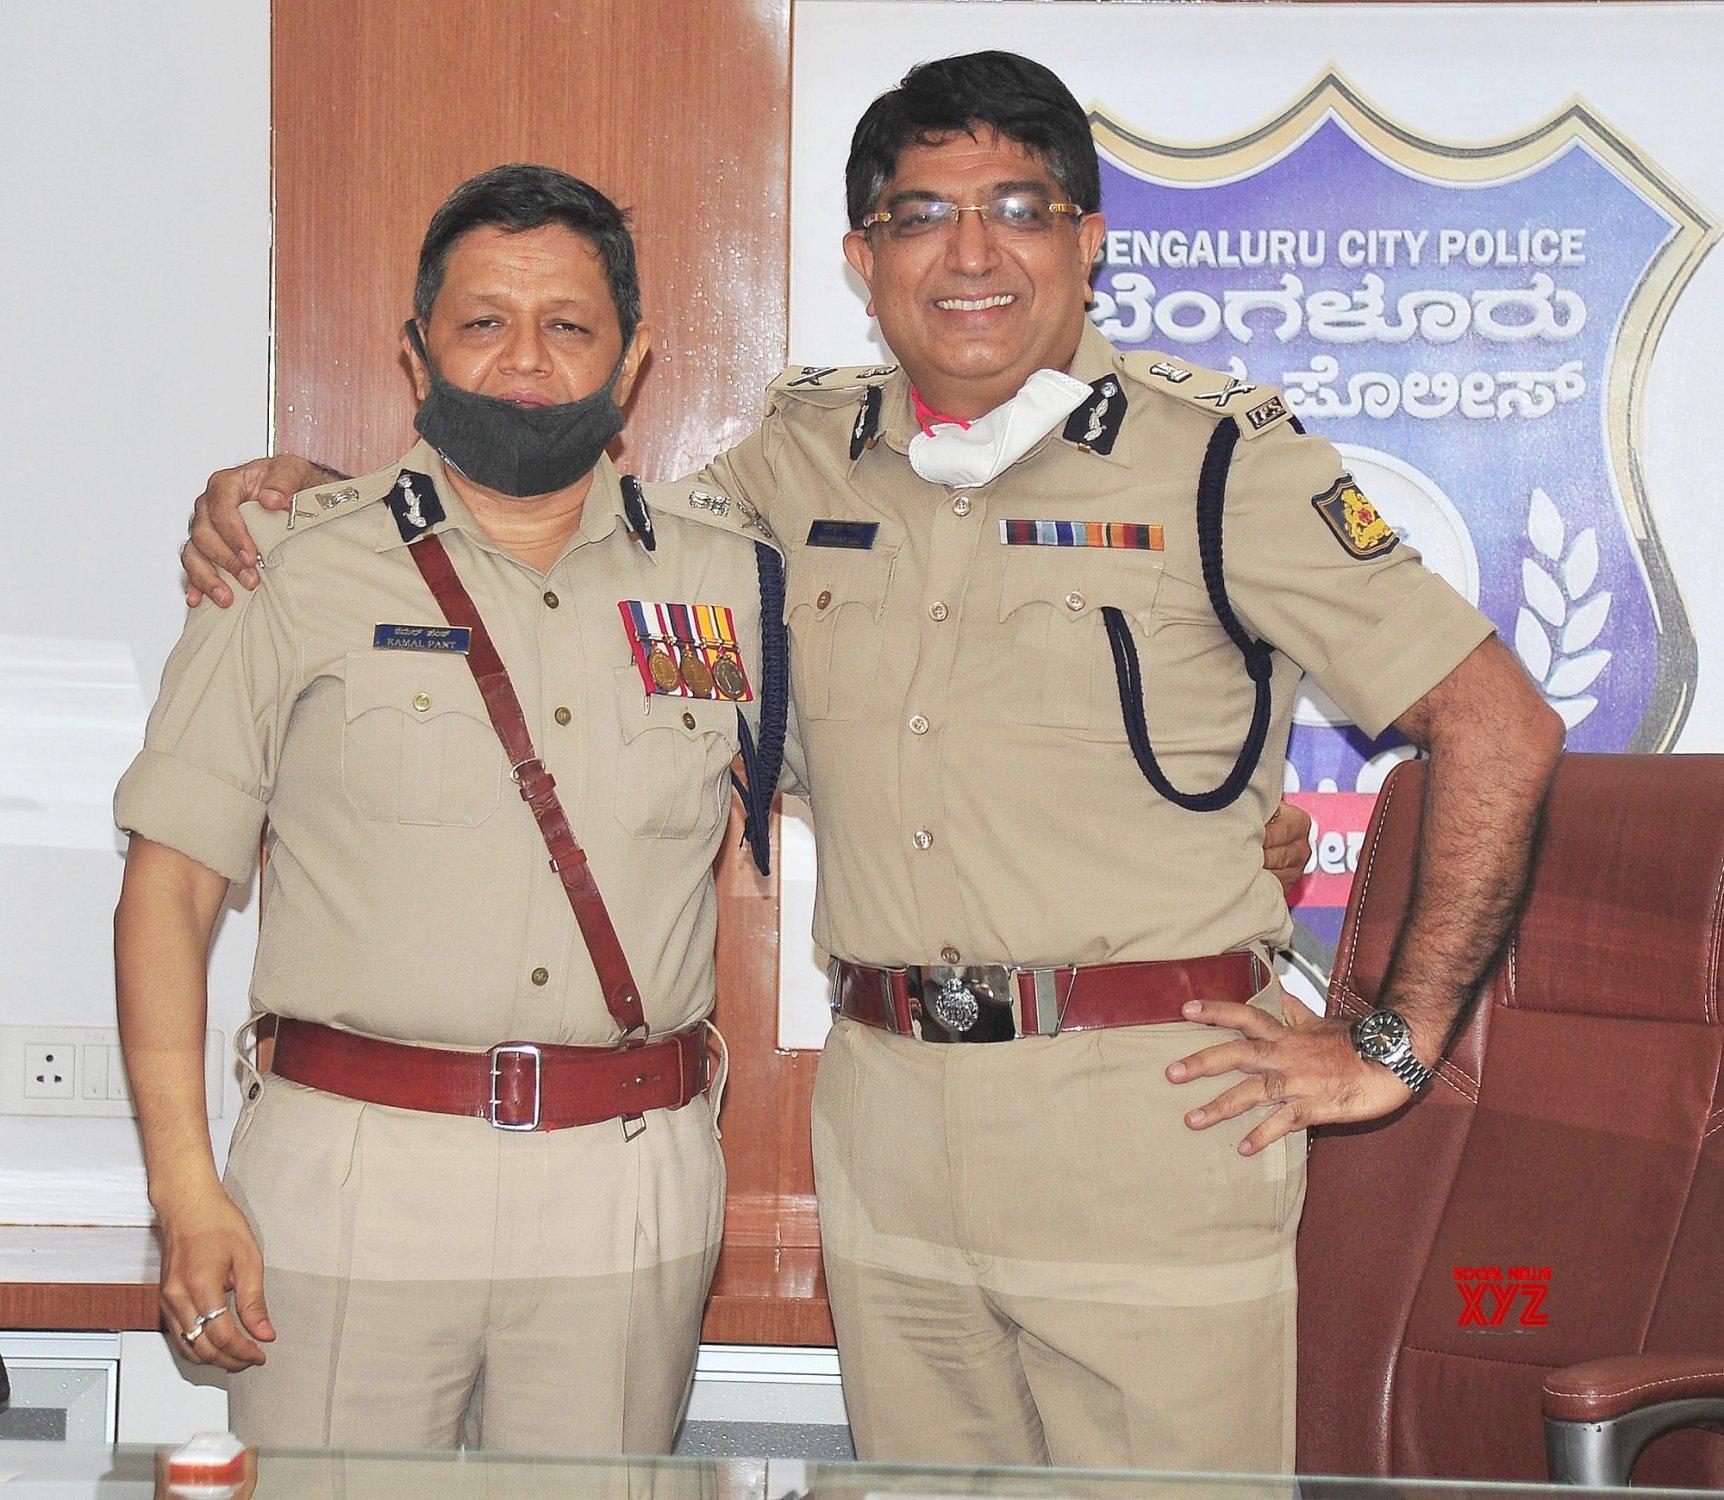 Bengaluru: Kamal Panth takes charge as new Bengaluru Police Commissioner #Gallery